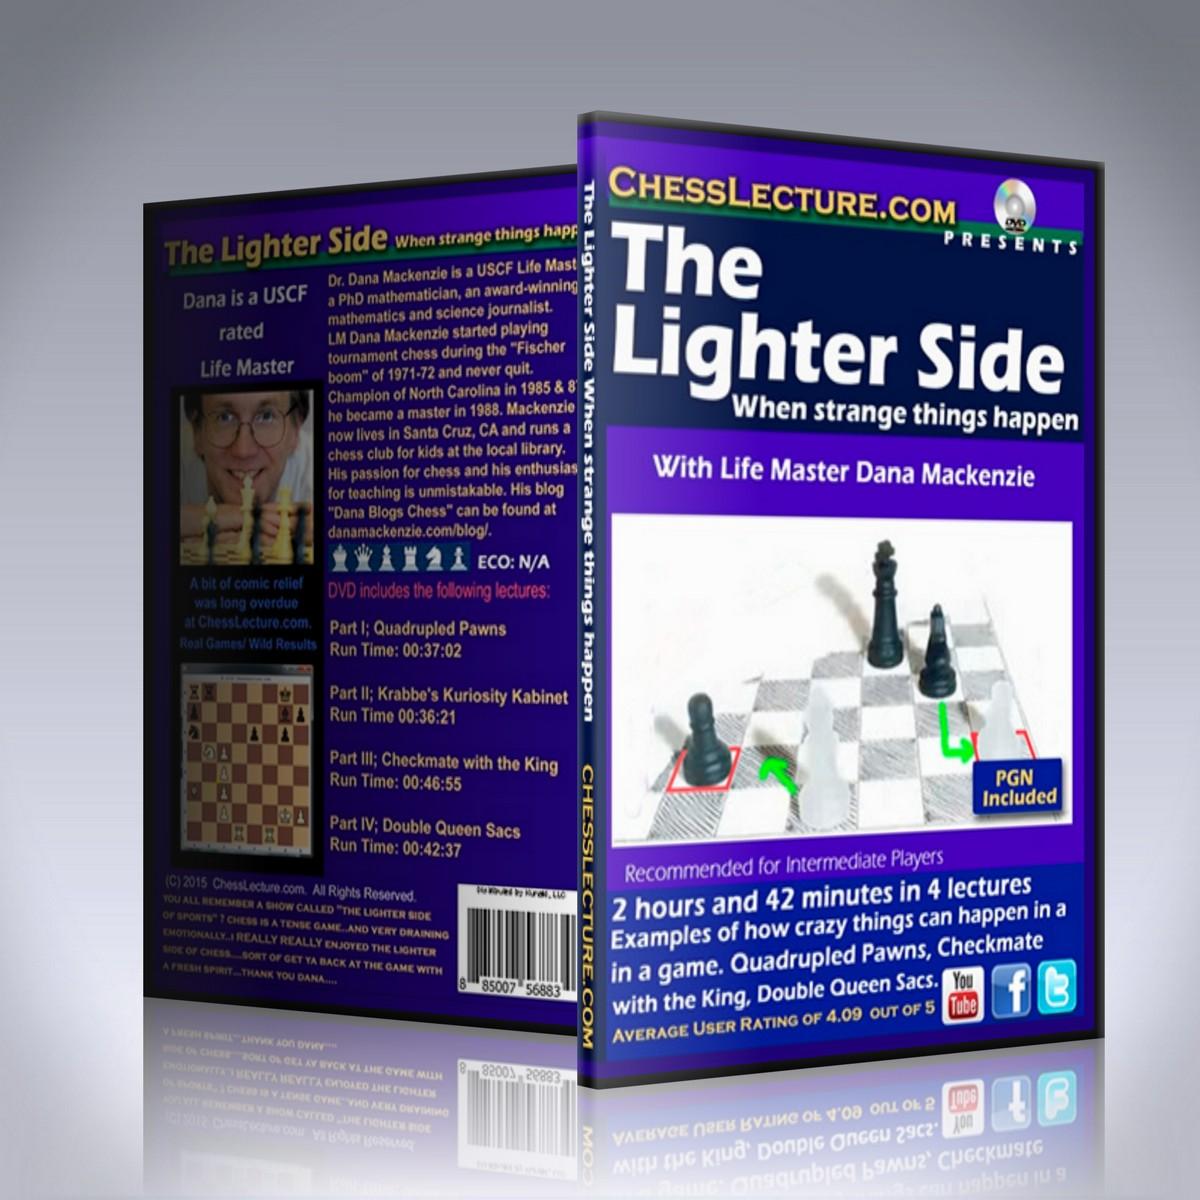 The Lighter Side – LM Dana Mackenzie